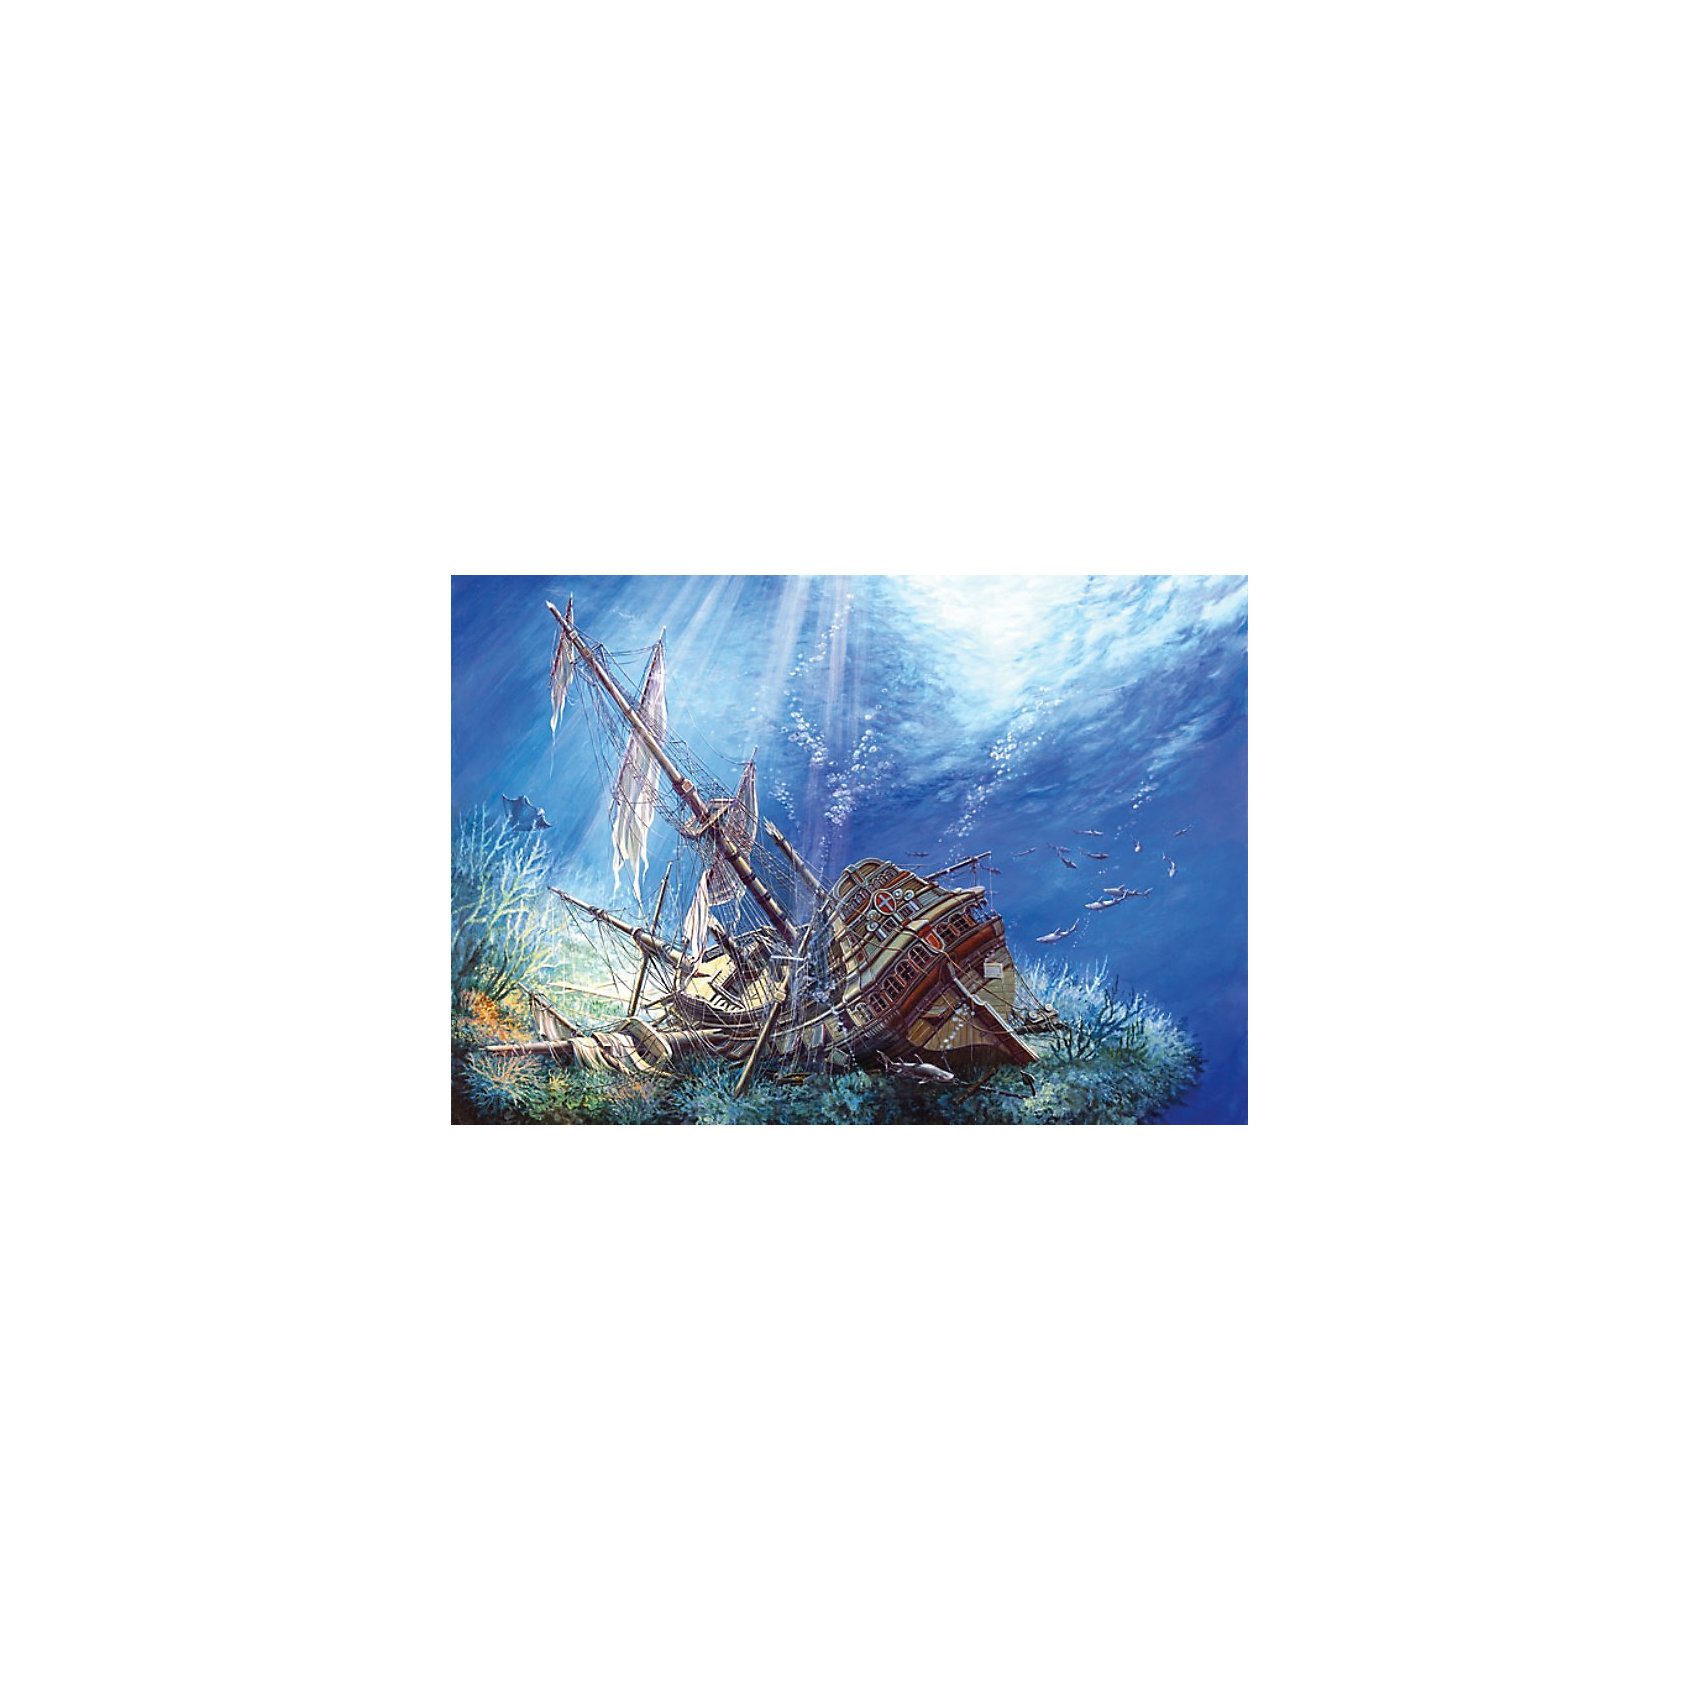 Castorland Пазл Затонувший корабль, 2000 деталей, Castorland castorland пазл красная шапочка castorland 20 деталей